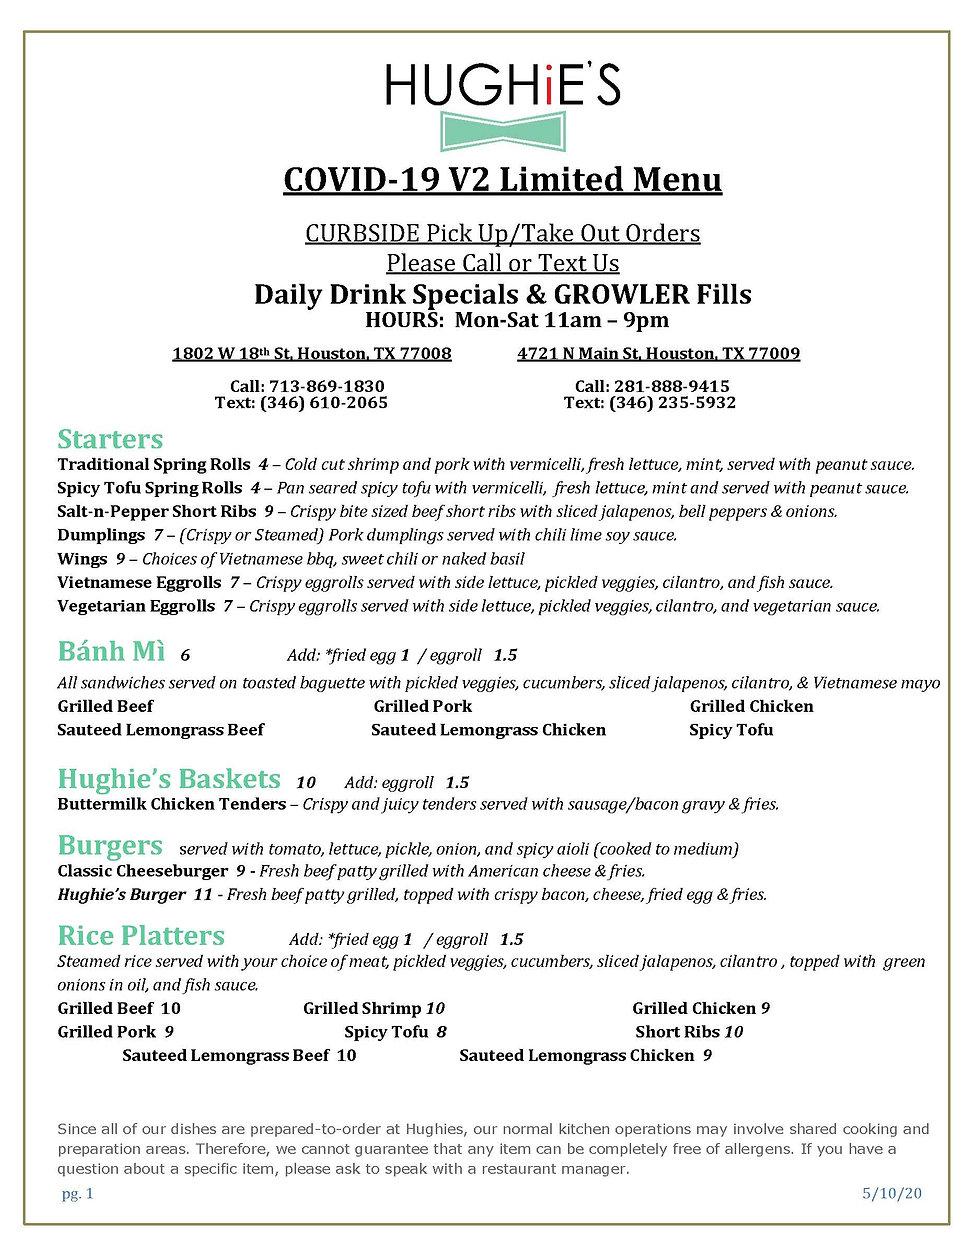 COVID MENU V2.2p1.jpg